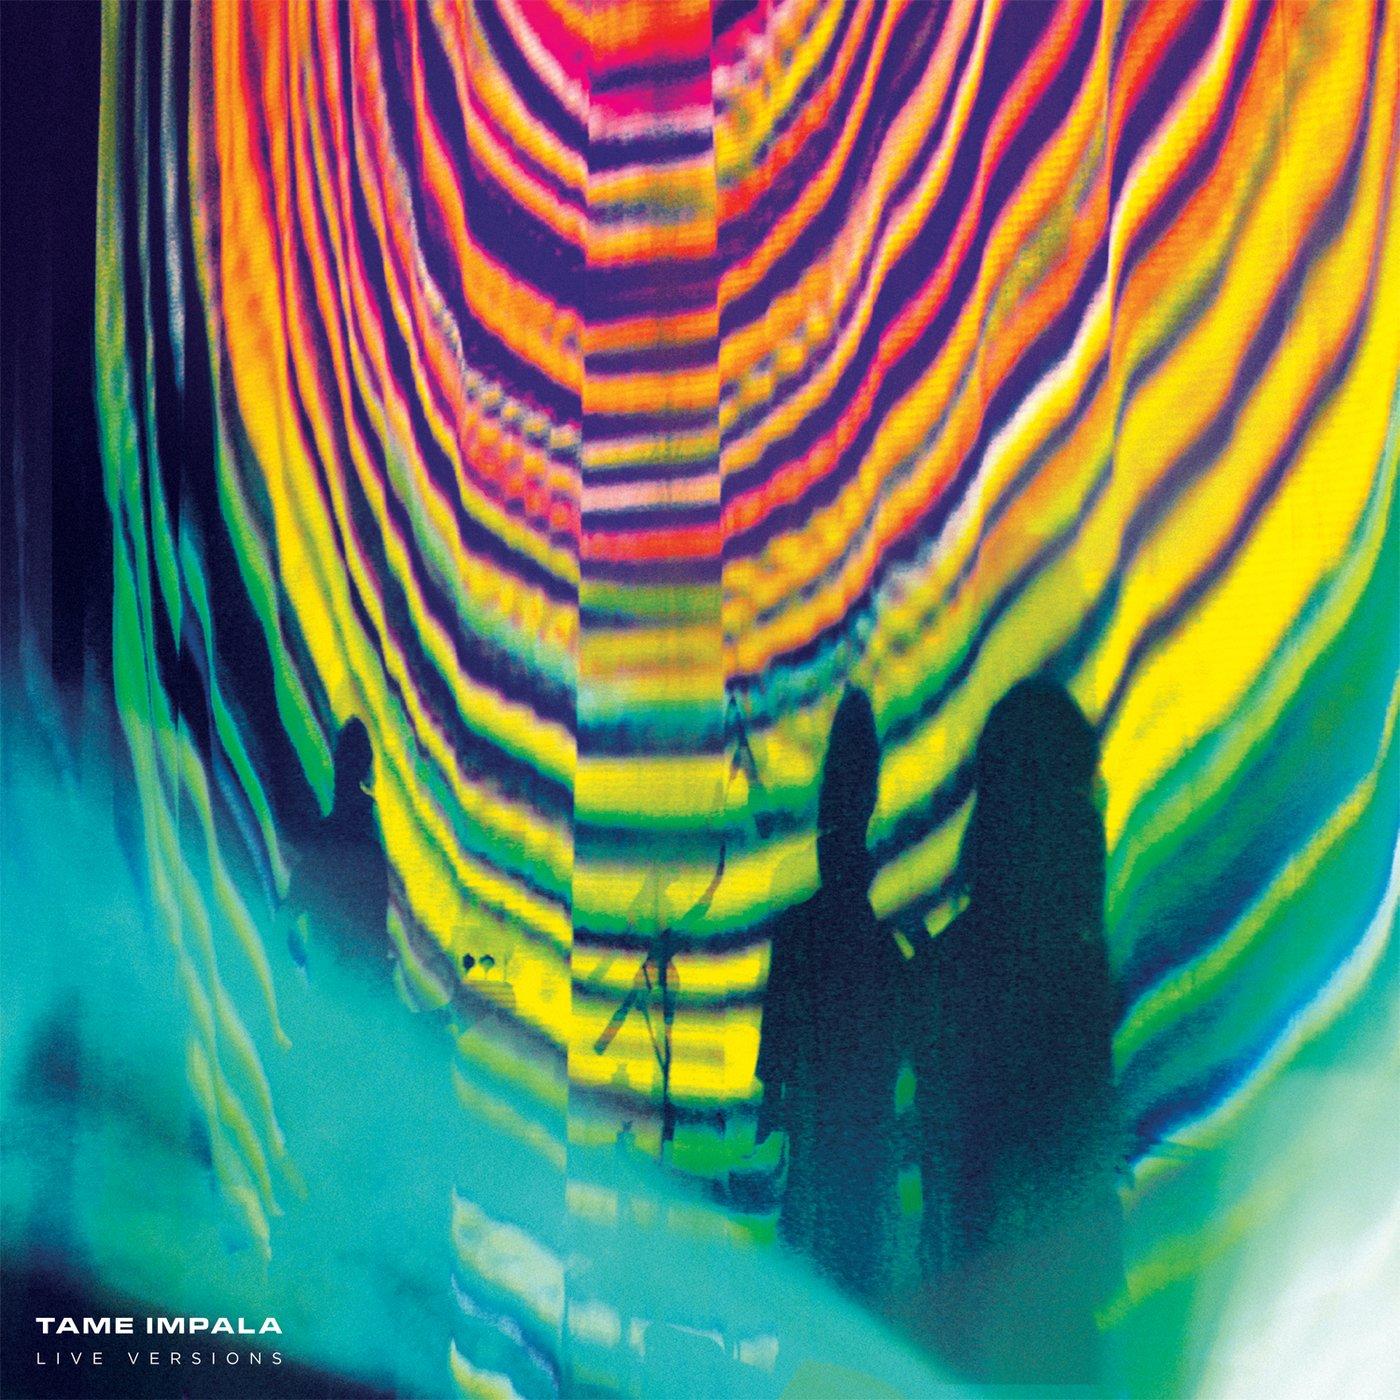 Tame Impala - Live Versions [LP]